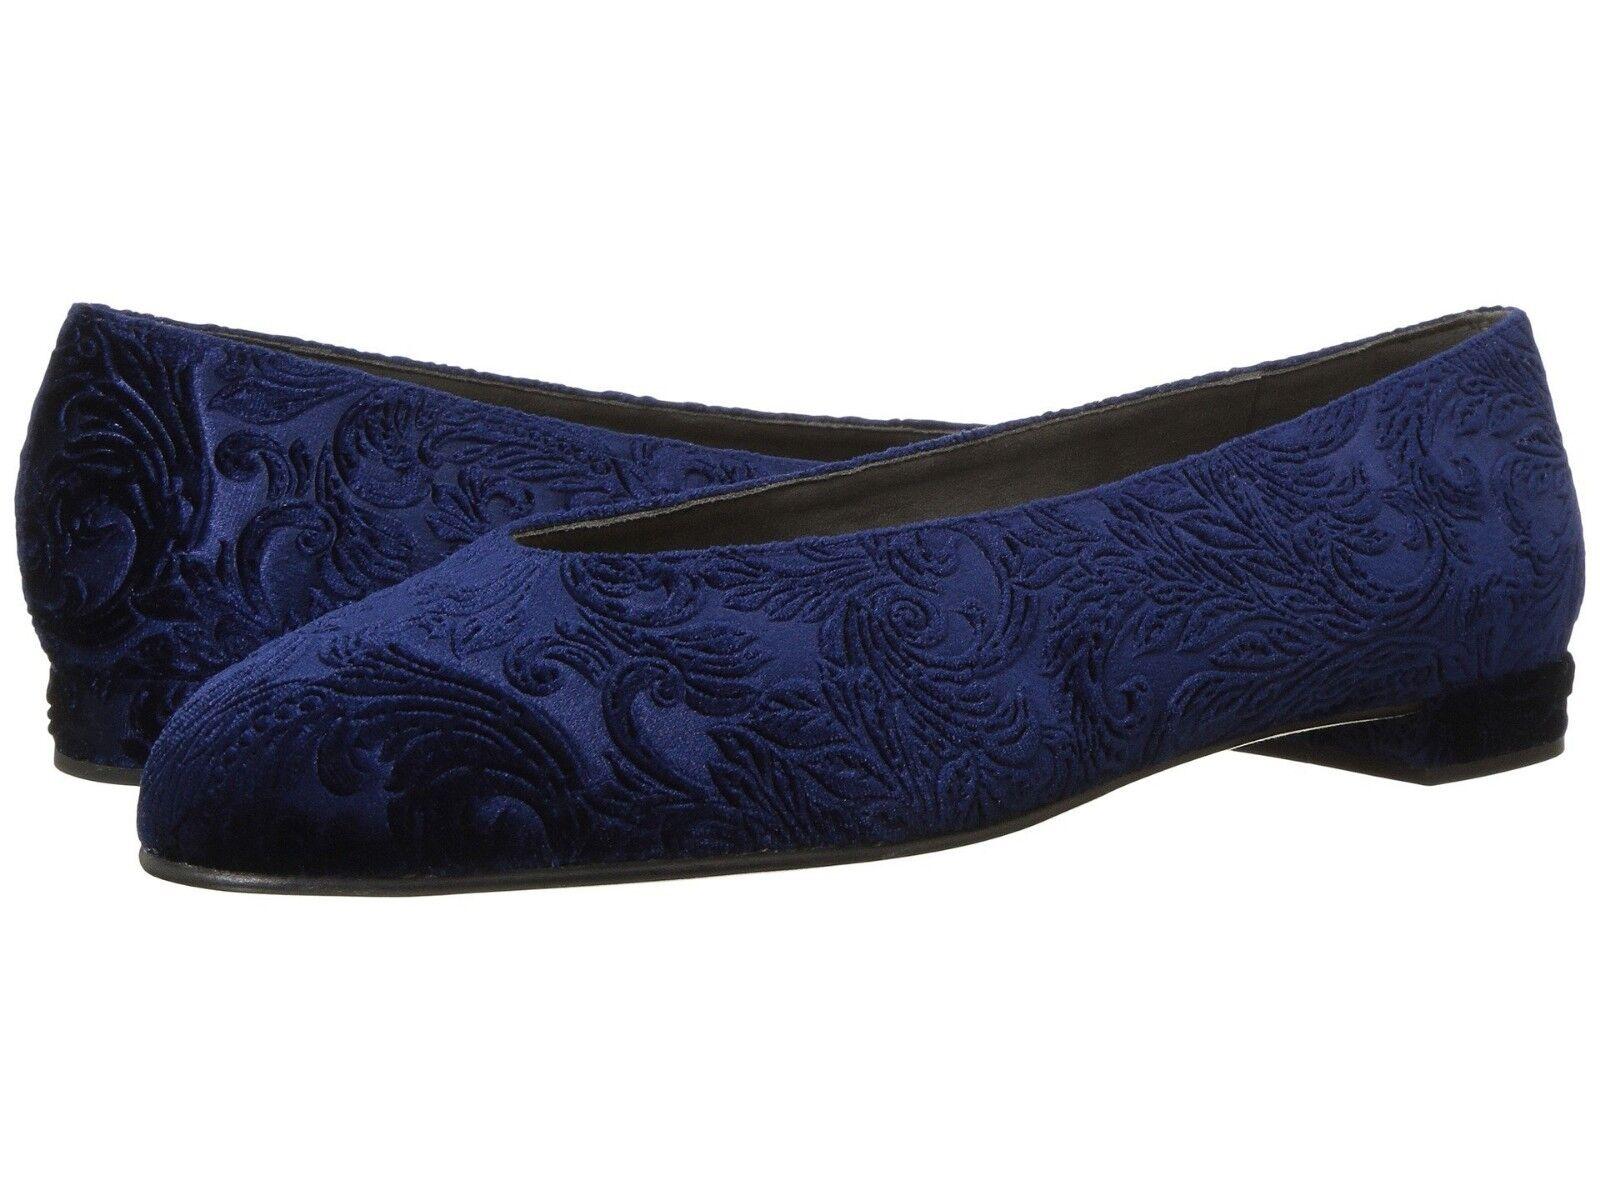 NIB Stuart Weitzman Chicflat Size Size Chicflat 8 Blue Velvet Prussian Romantic Flats $365 62a176